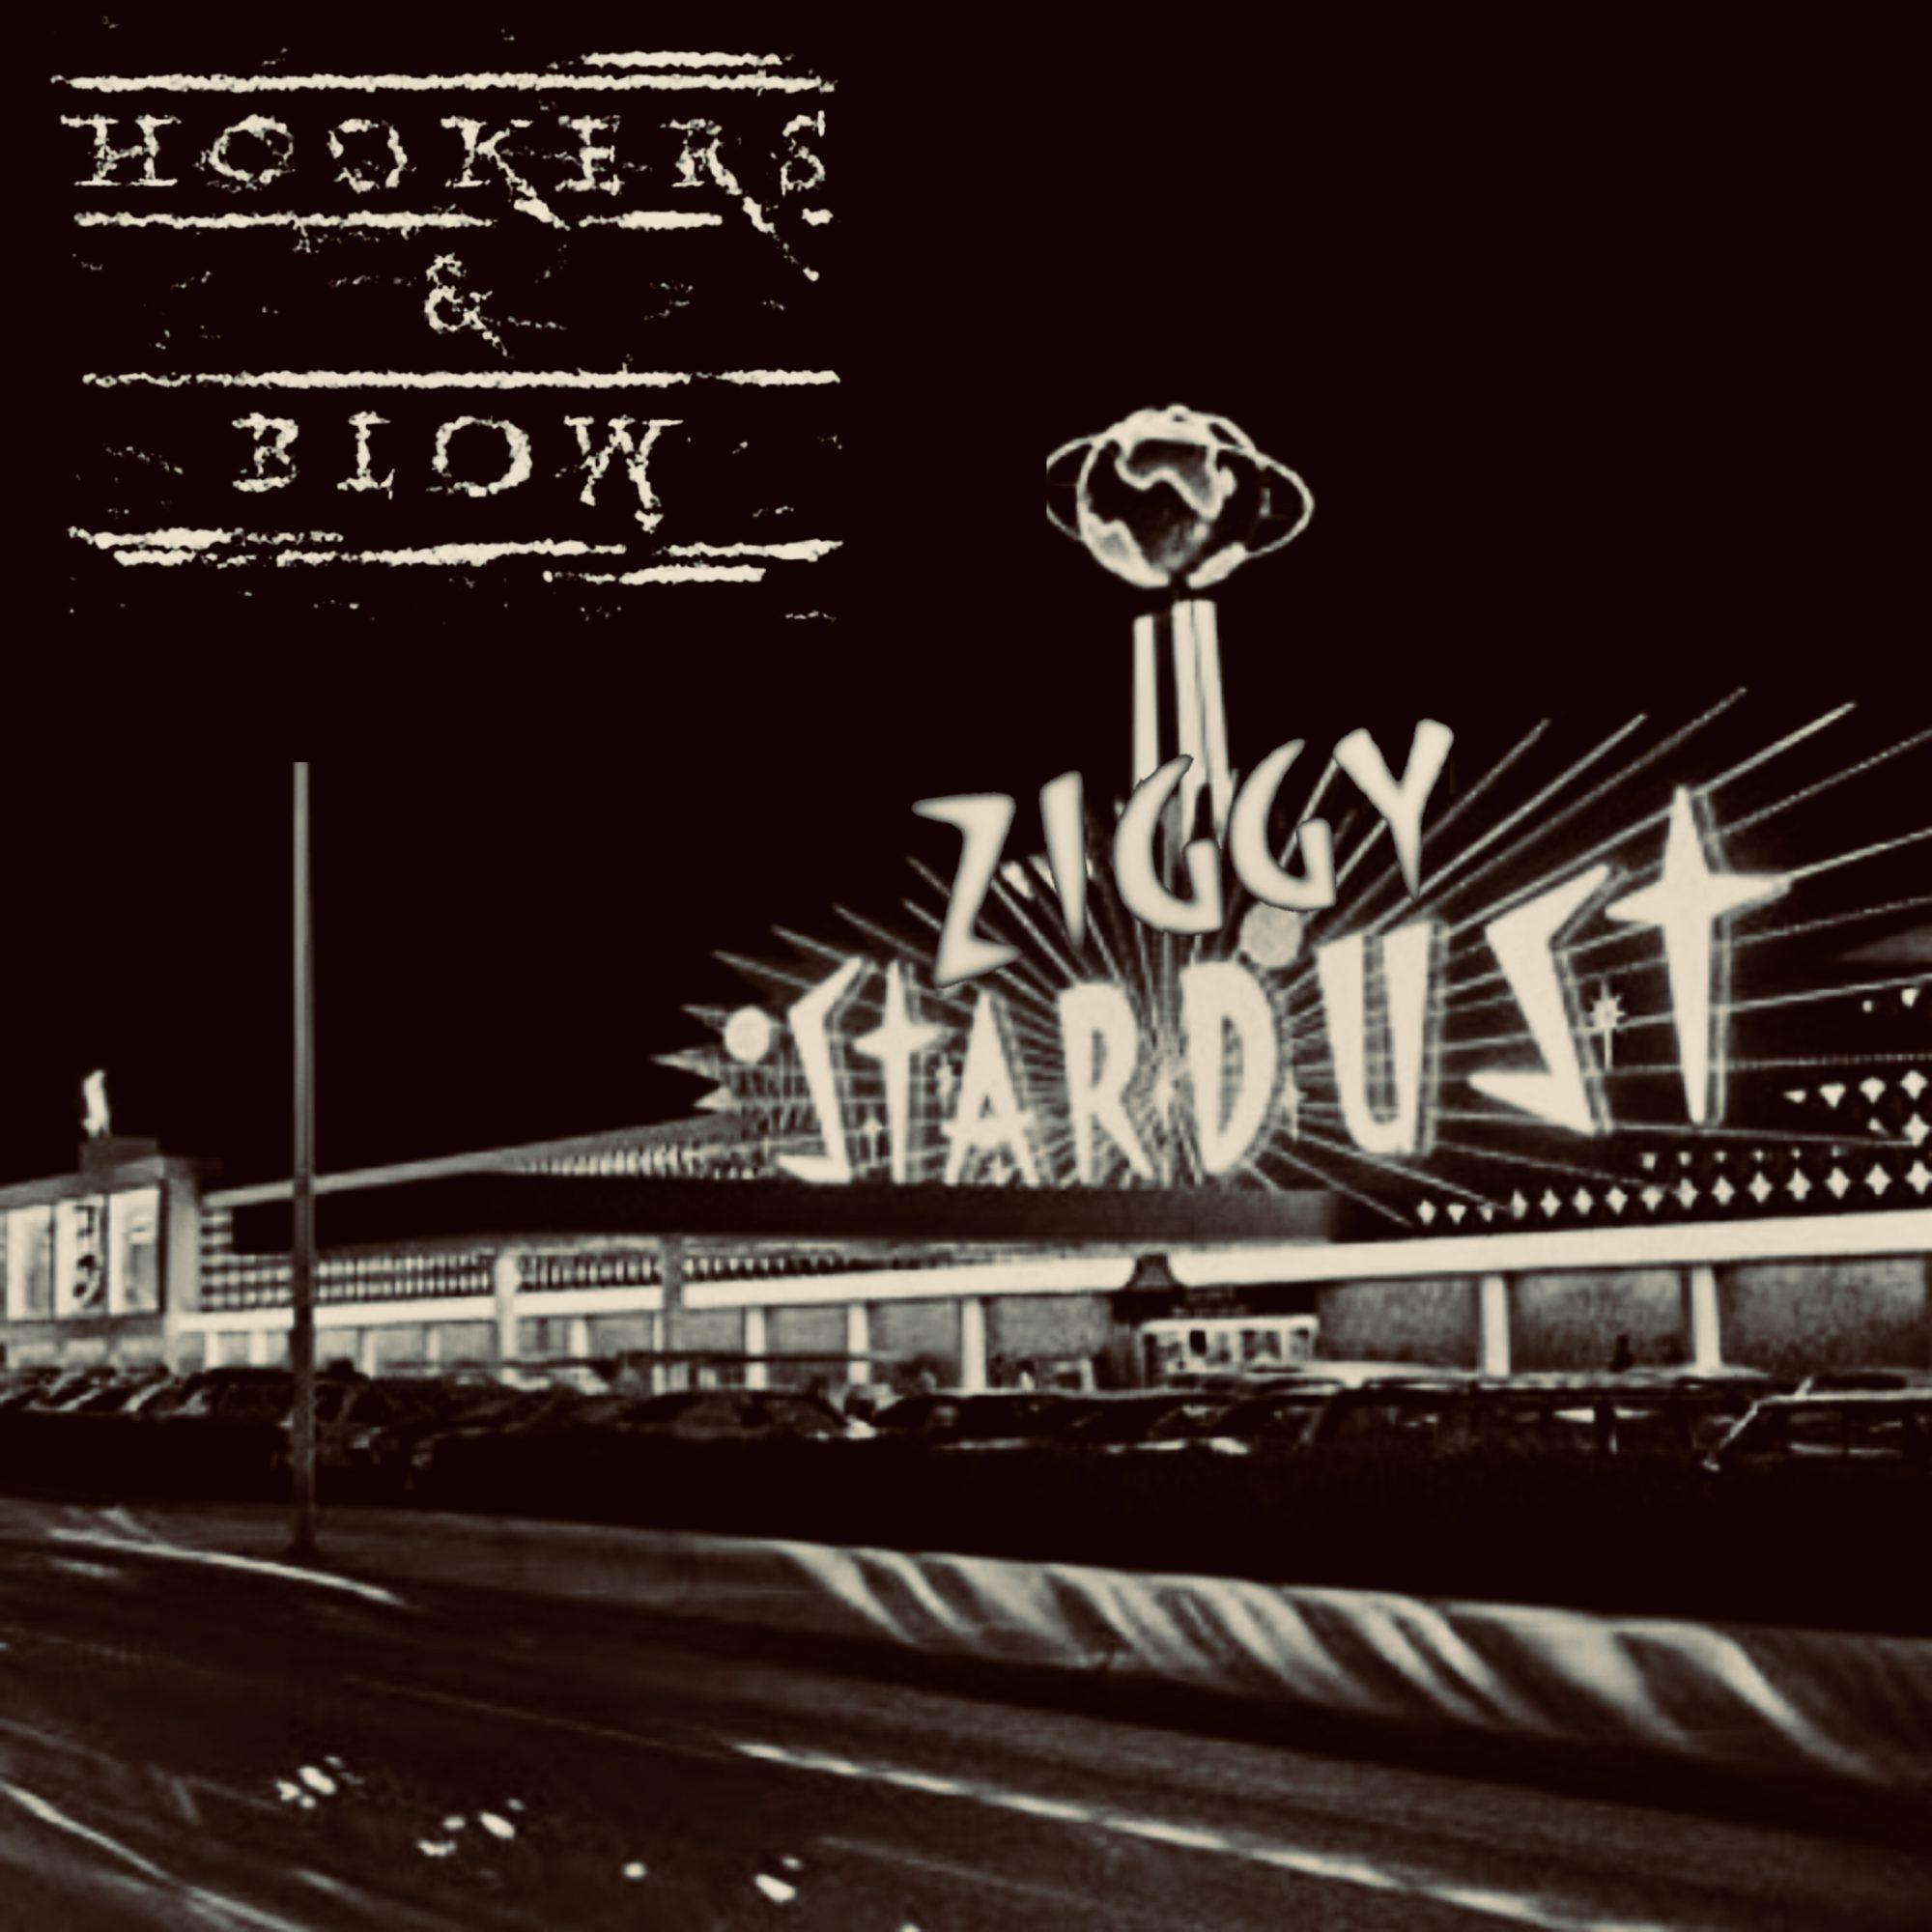 HOOKERS & BLOWTO RELEASE NEW SINGLE 'ZIGGY STARDUST'